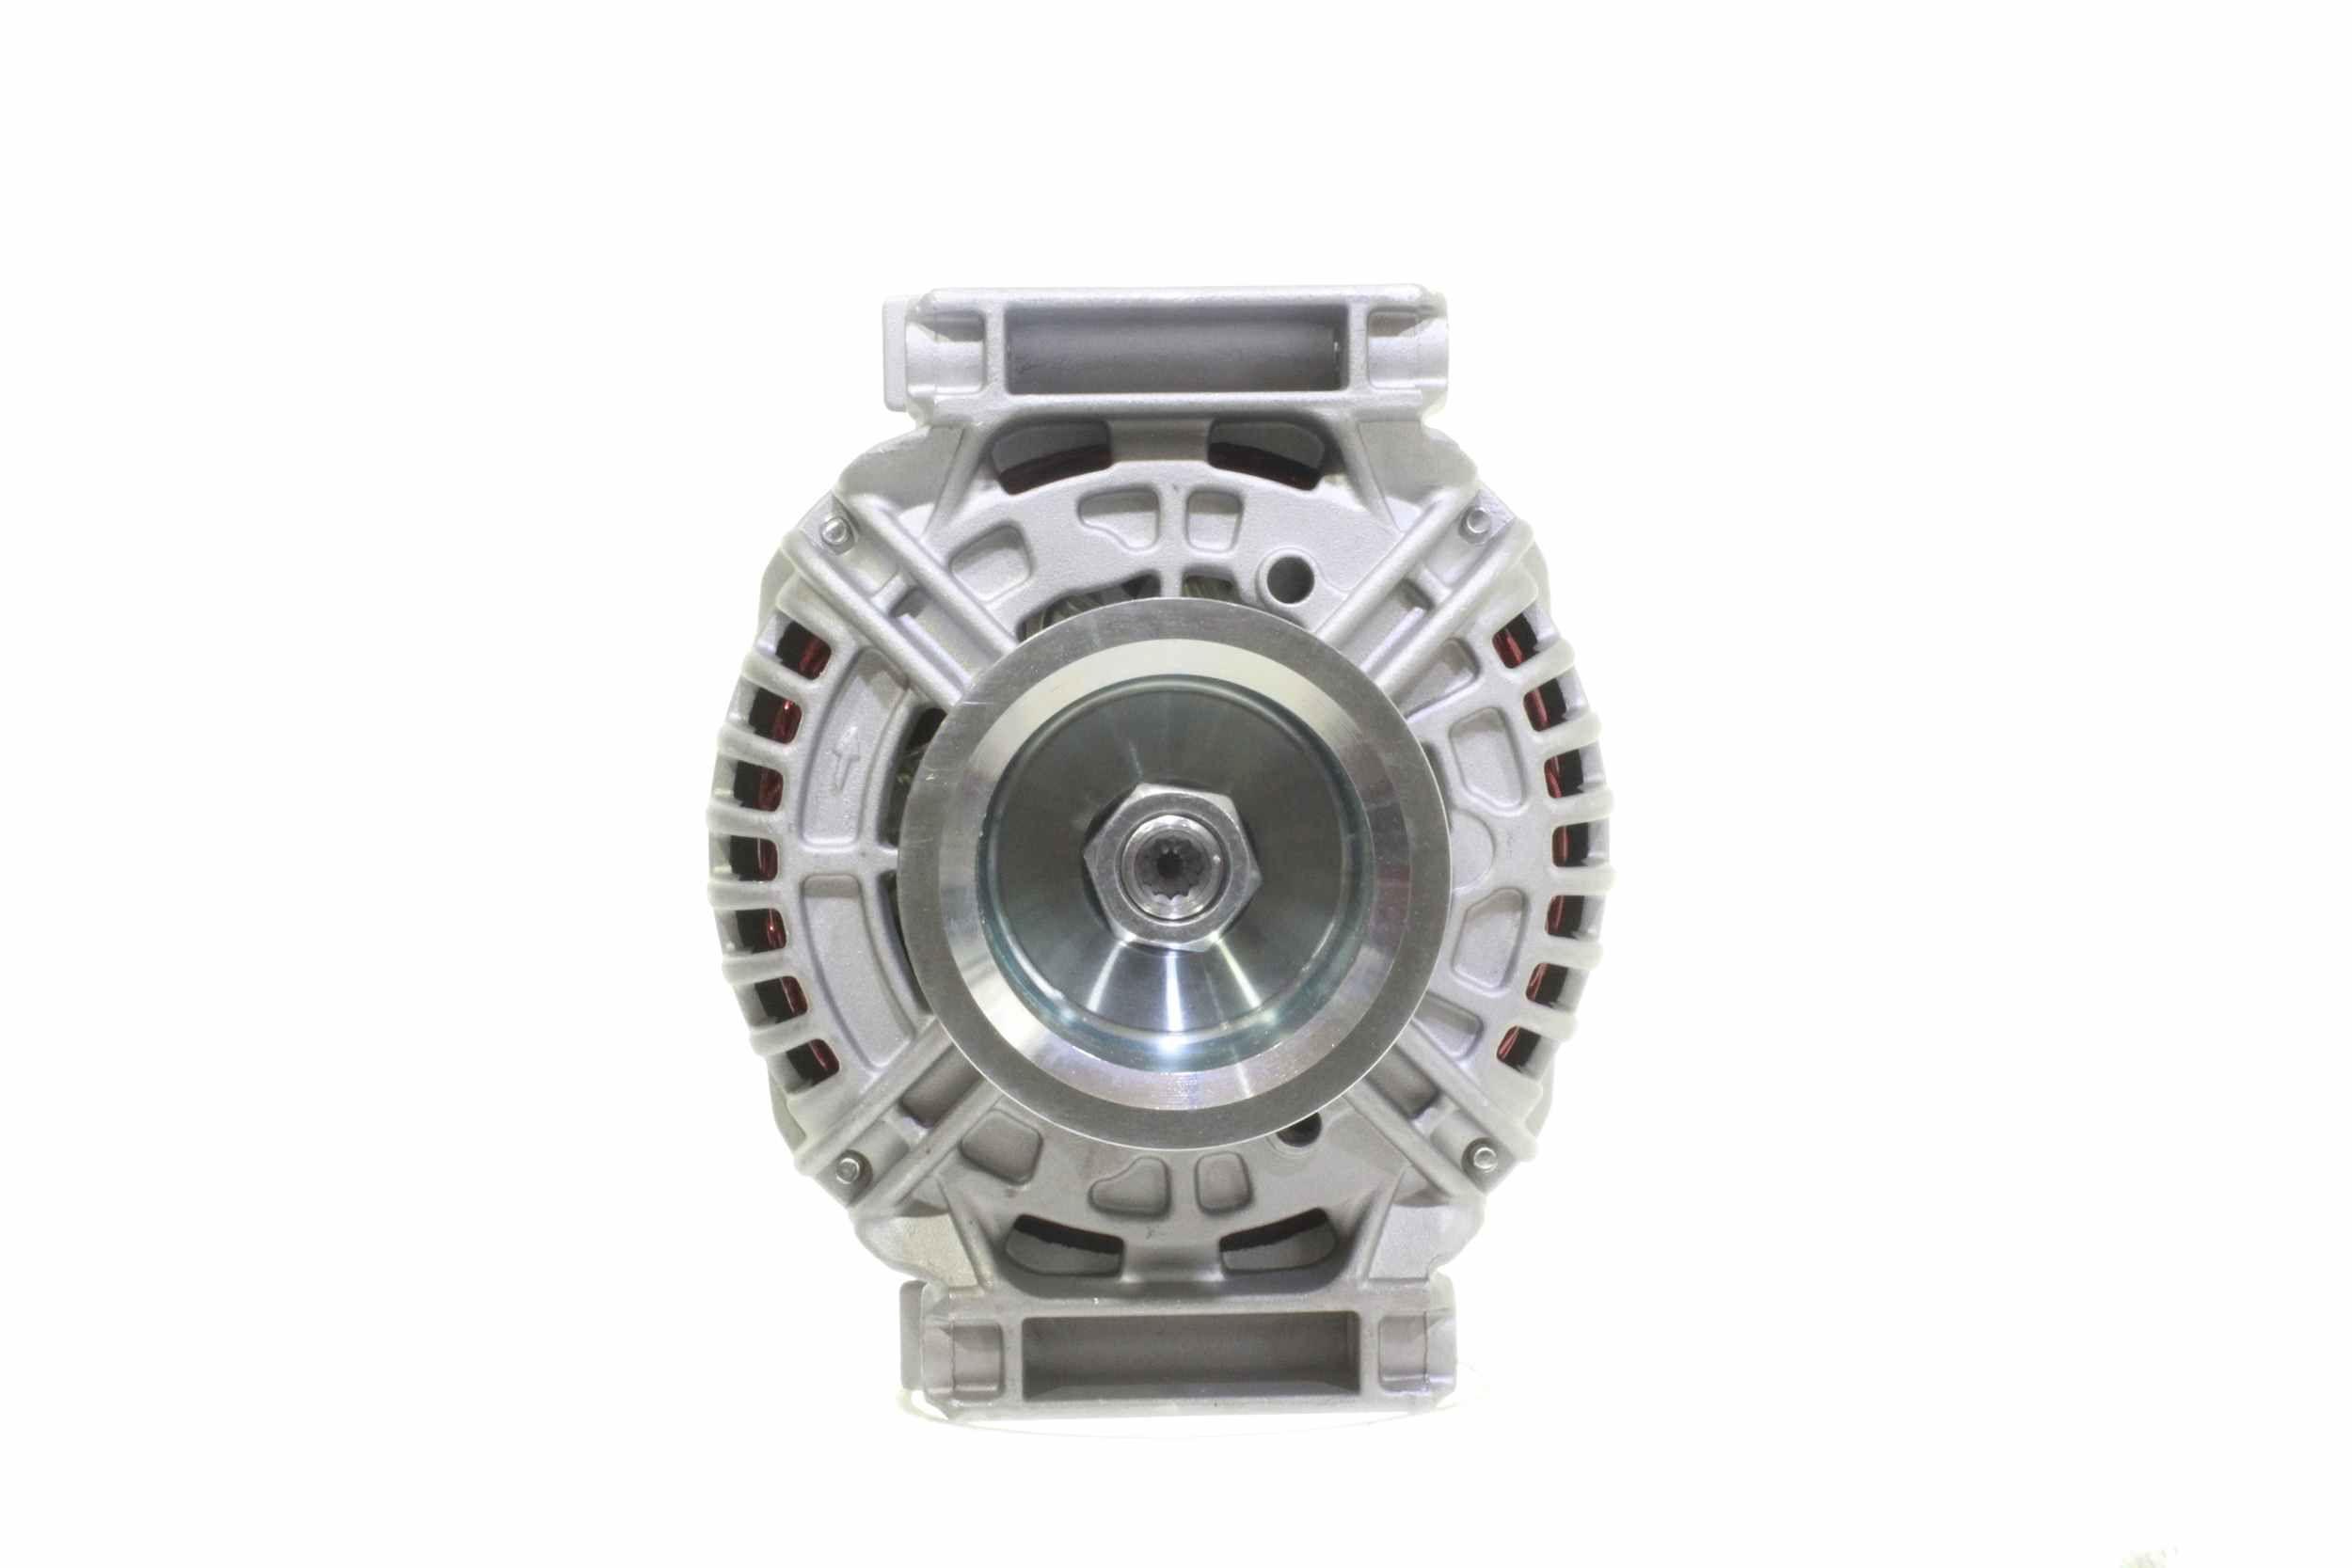 ALANKO Alternator do SCANIA - numer produktu: 10443259